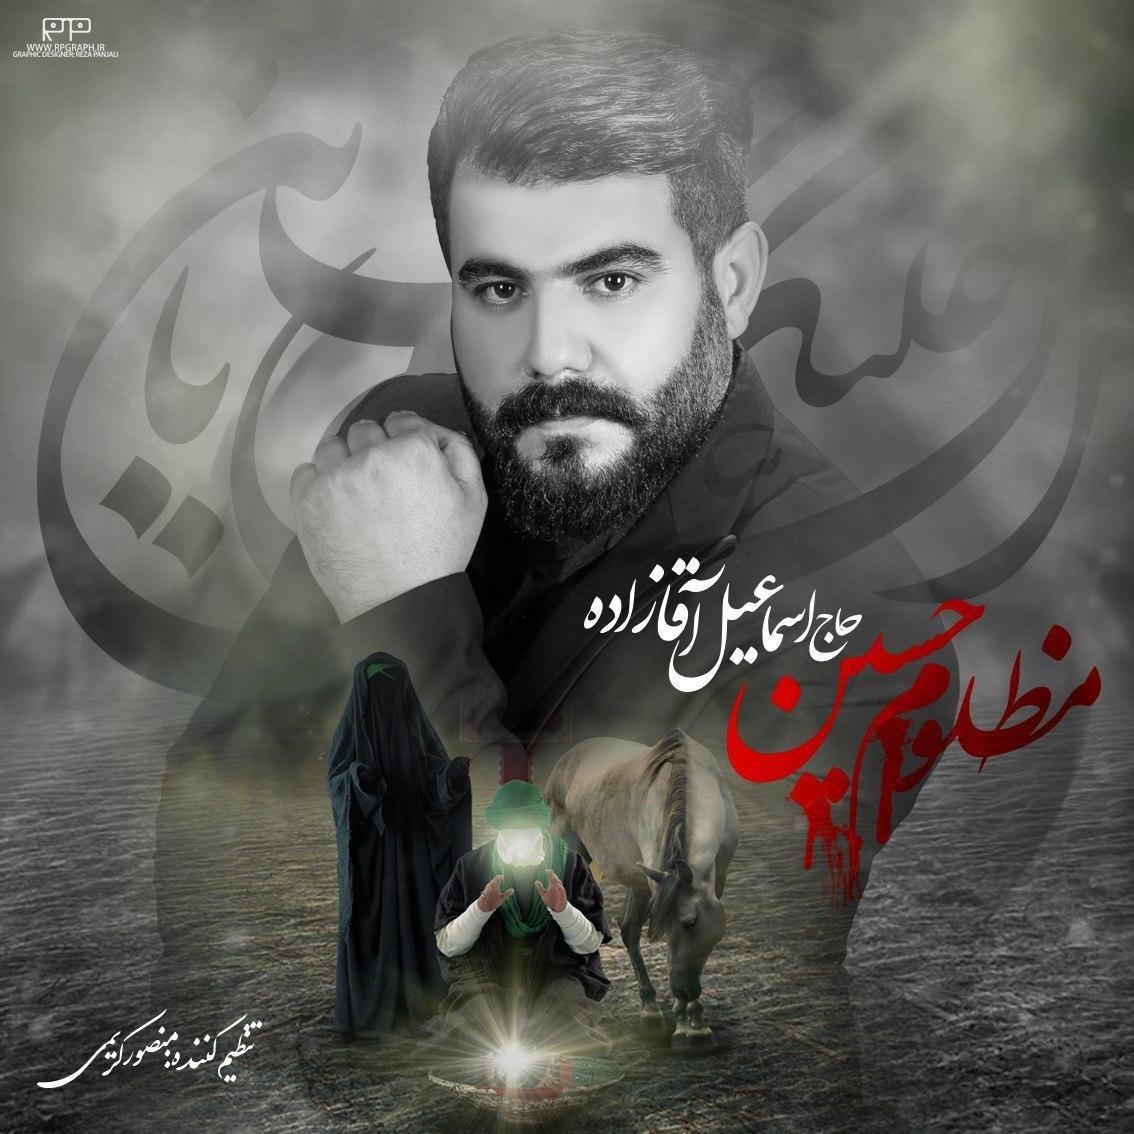 http://s14.picofile.com/file/8408899268/02Eamaeil_Agazadeh_Mazlom_Hossein.jpg